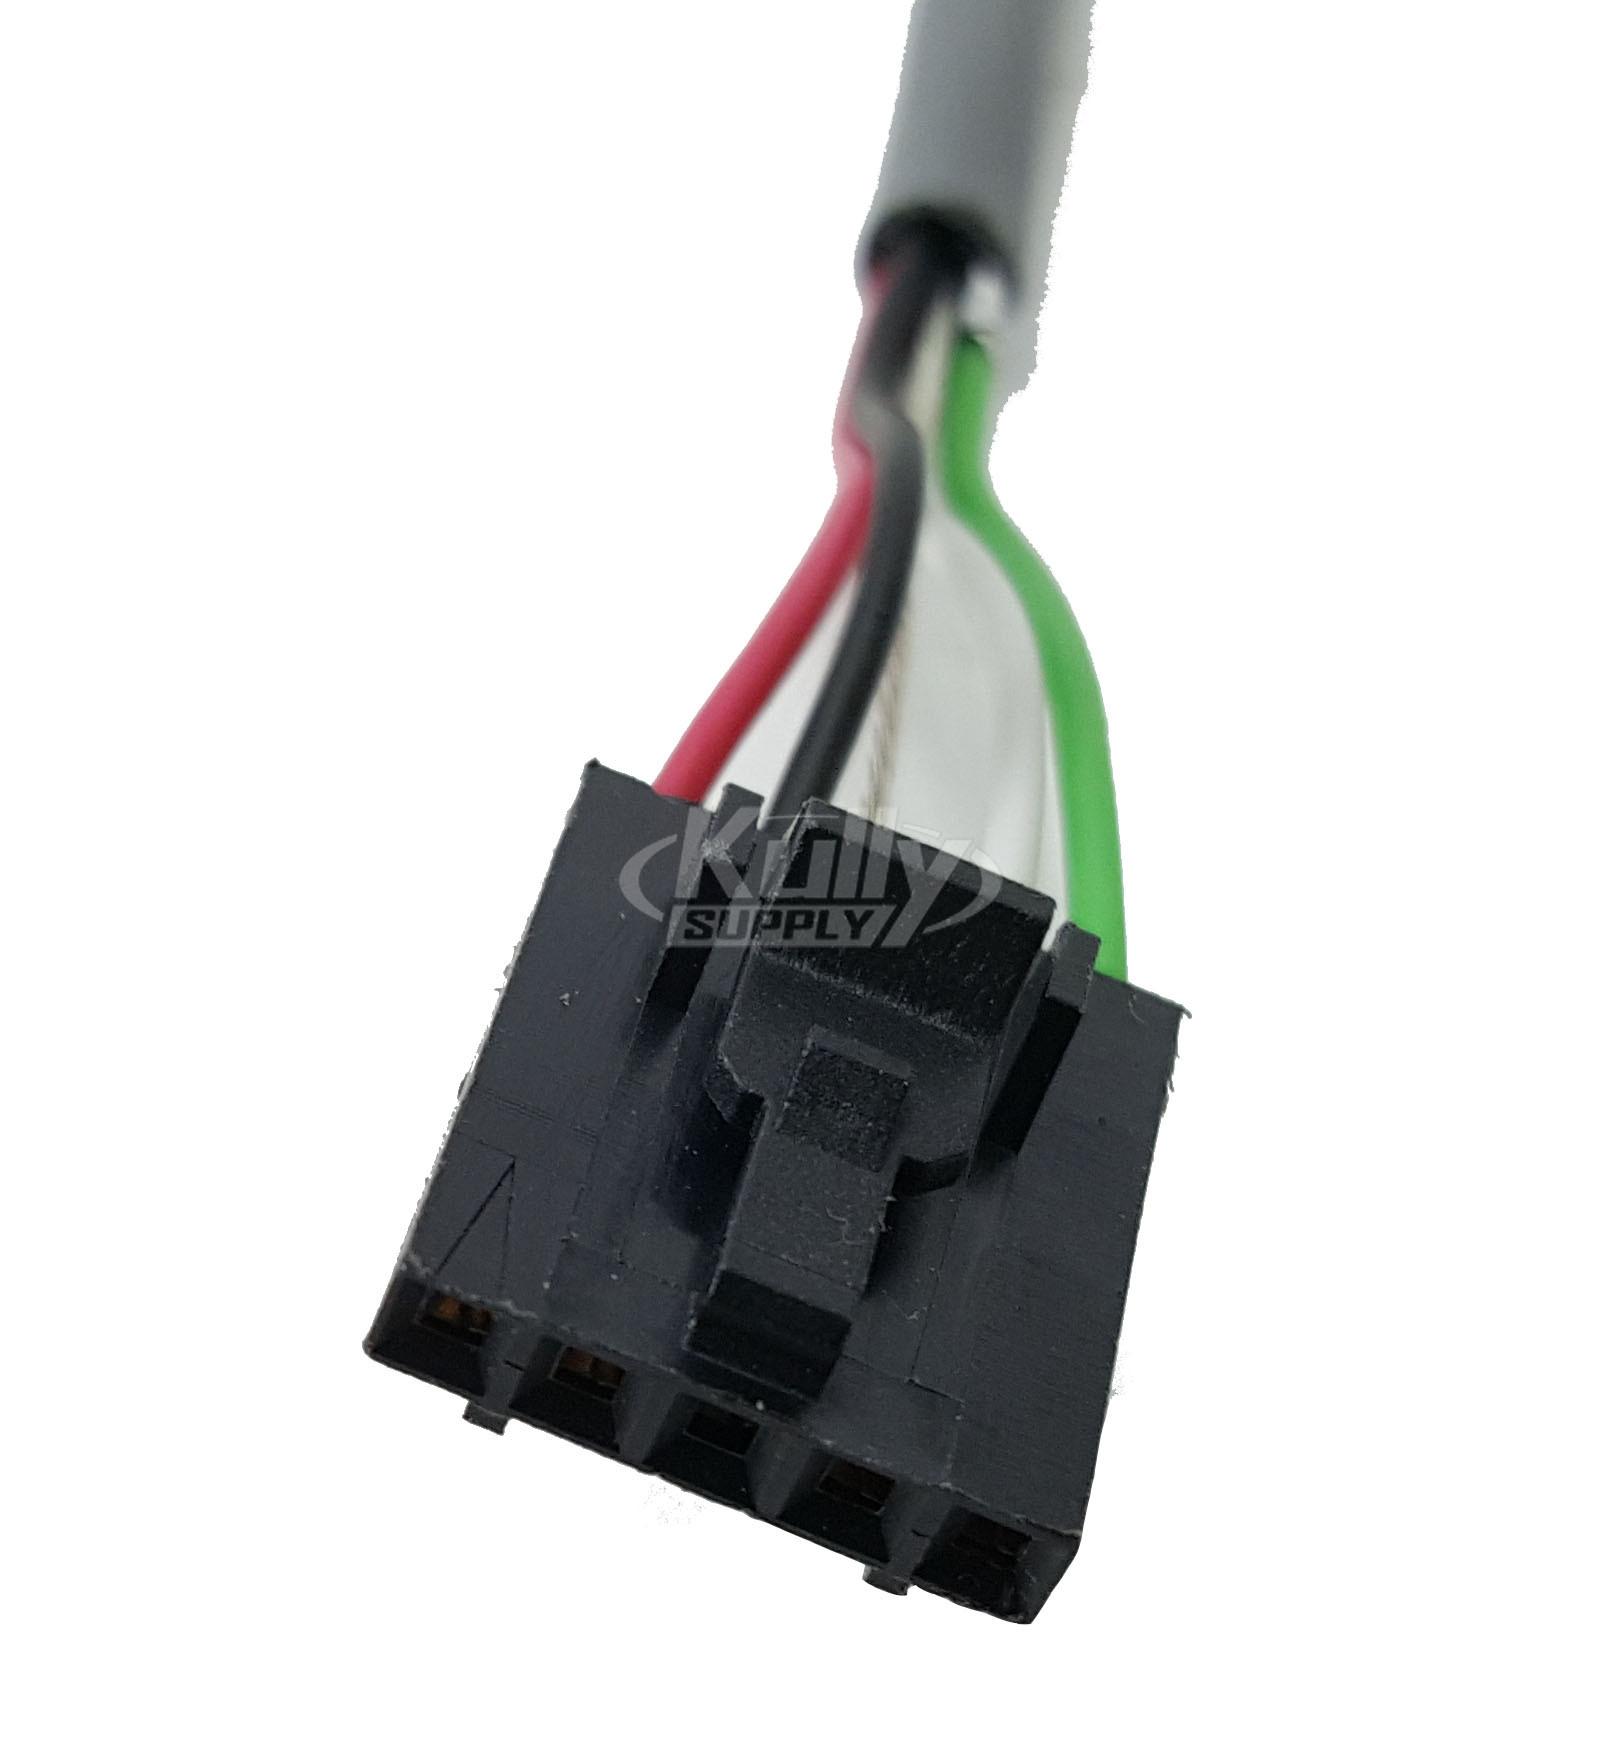 Sloan ETF-1019-A Microphone Sensor Junction Box Kit (for EL-3500-A ...